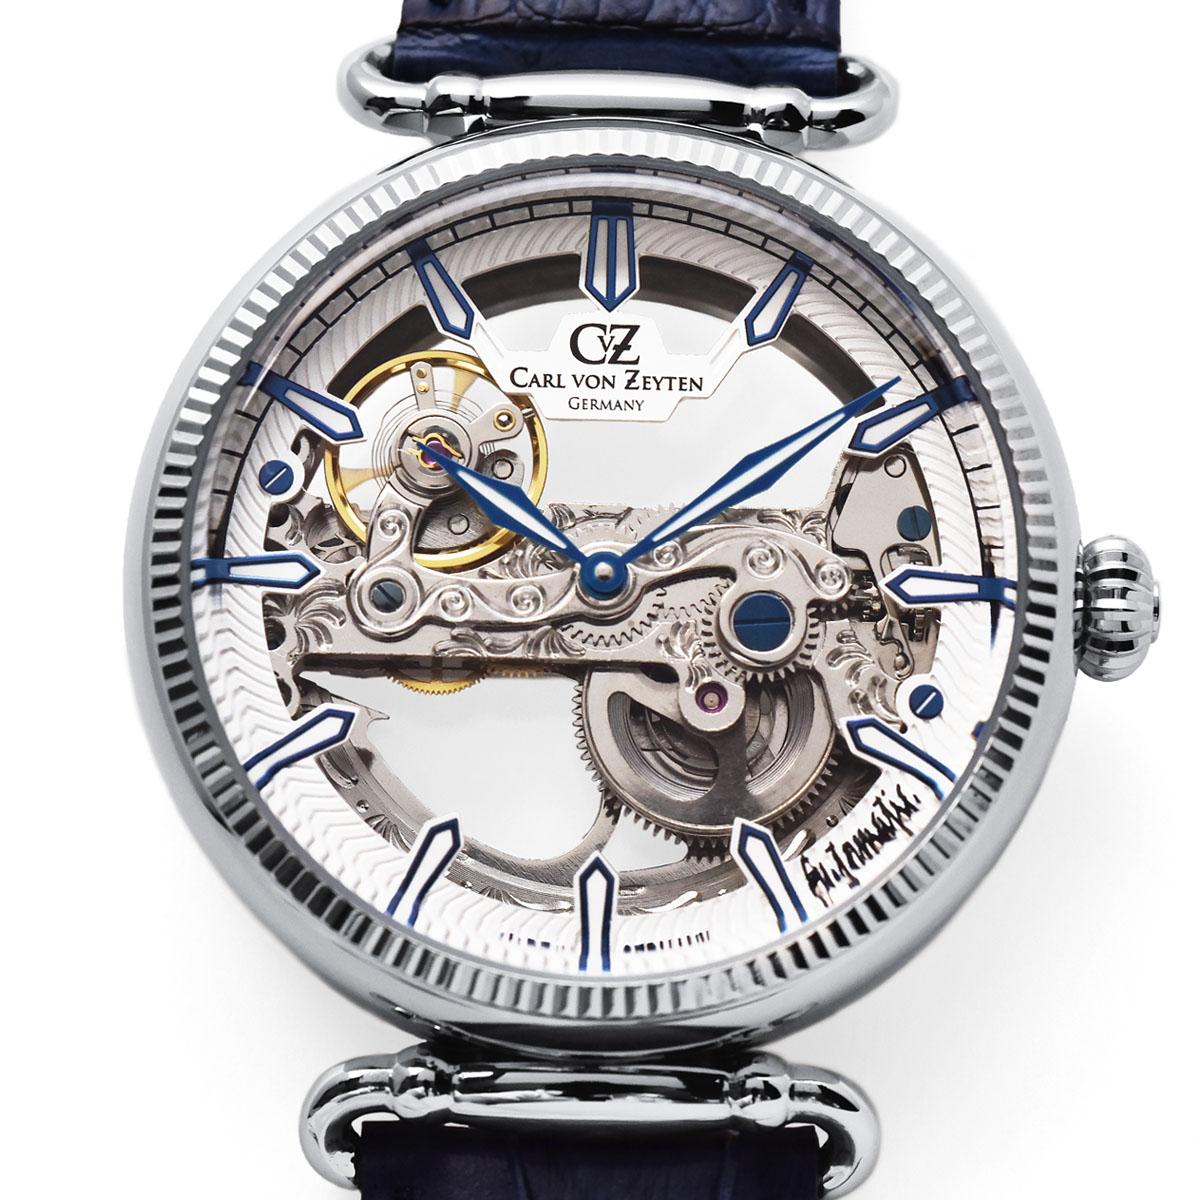 Carl von Zeyten カール・フォン・ツォイテン ELZACH エルツァッハ 自動巻き(手巻き機能あり) 腕時計 [CvZ0031WH] 正規代理店品